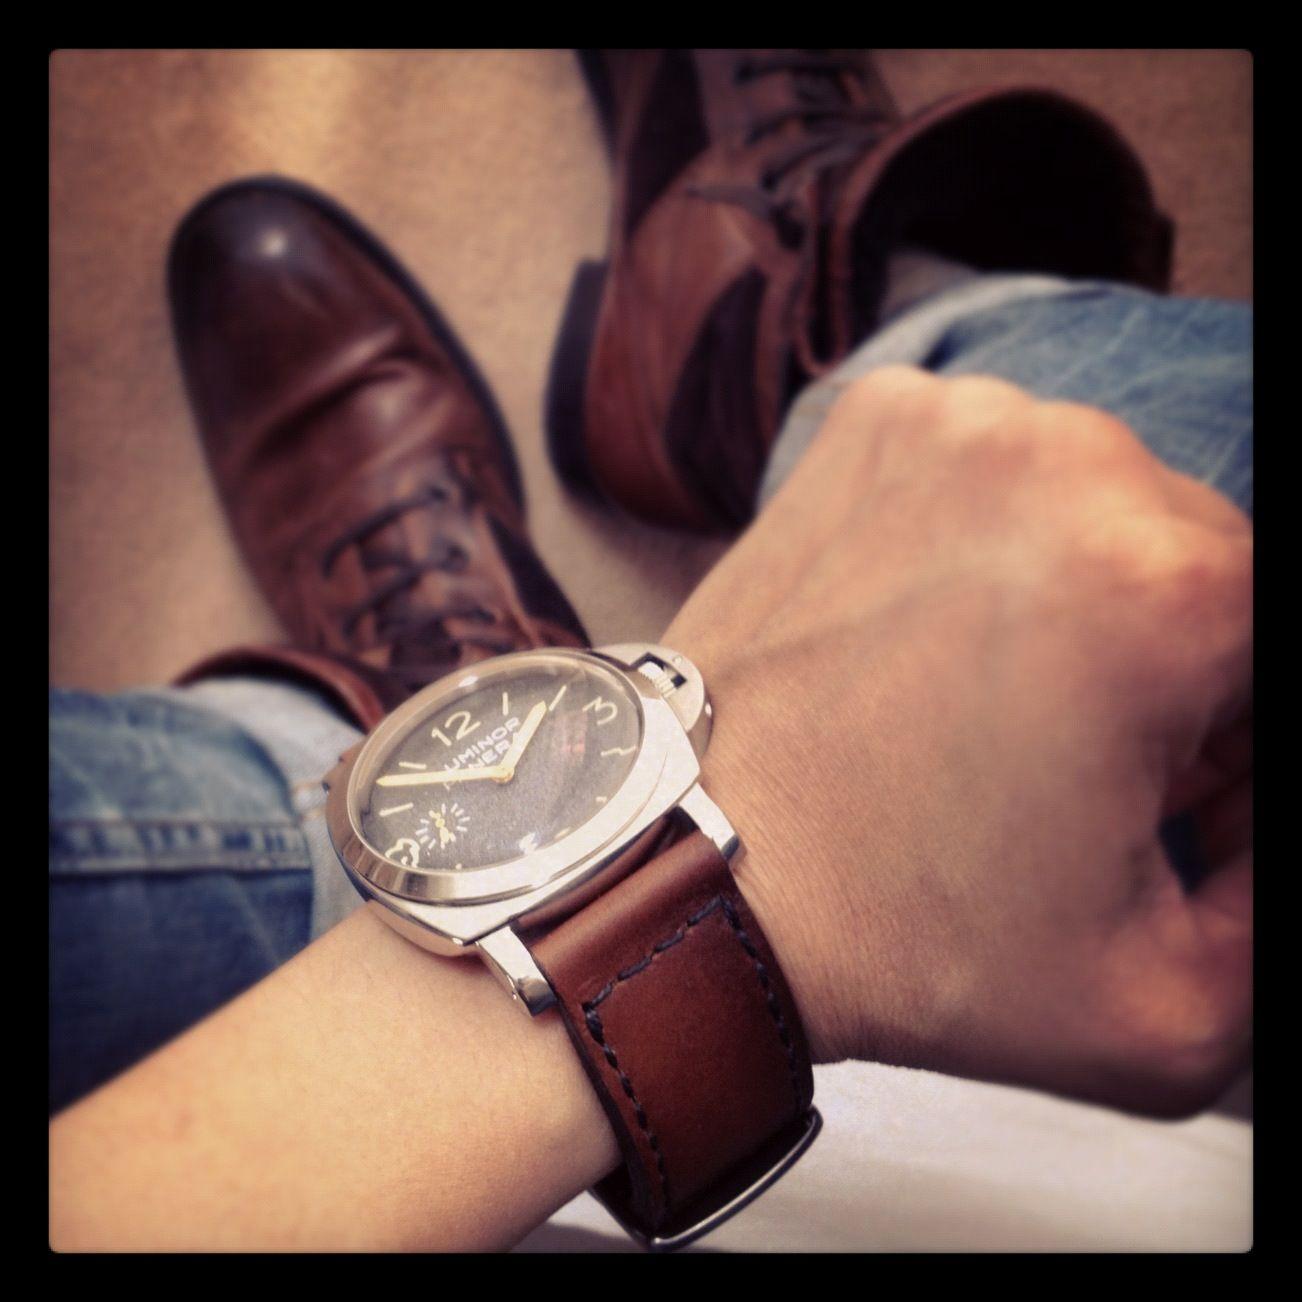 Vintage Panerai Luminor 6152/1 on  Brown Bas and Lokes Handmade Watch Strap <3